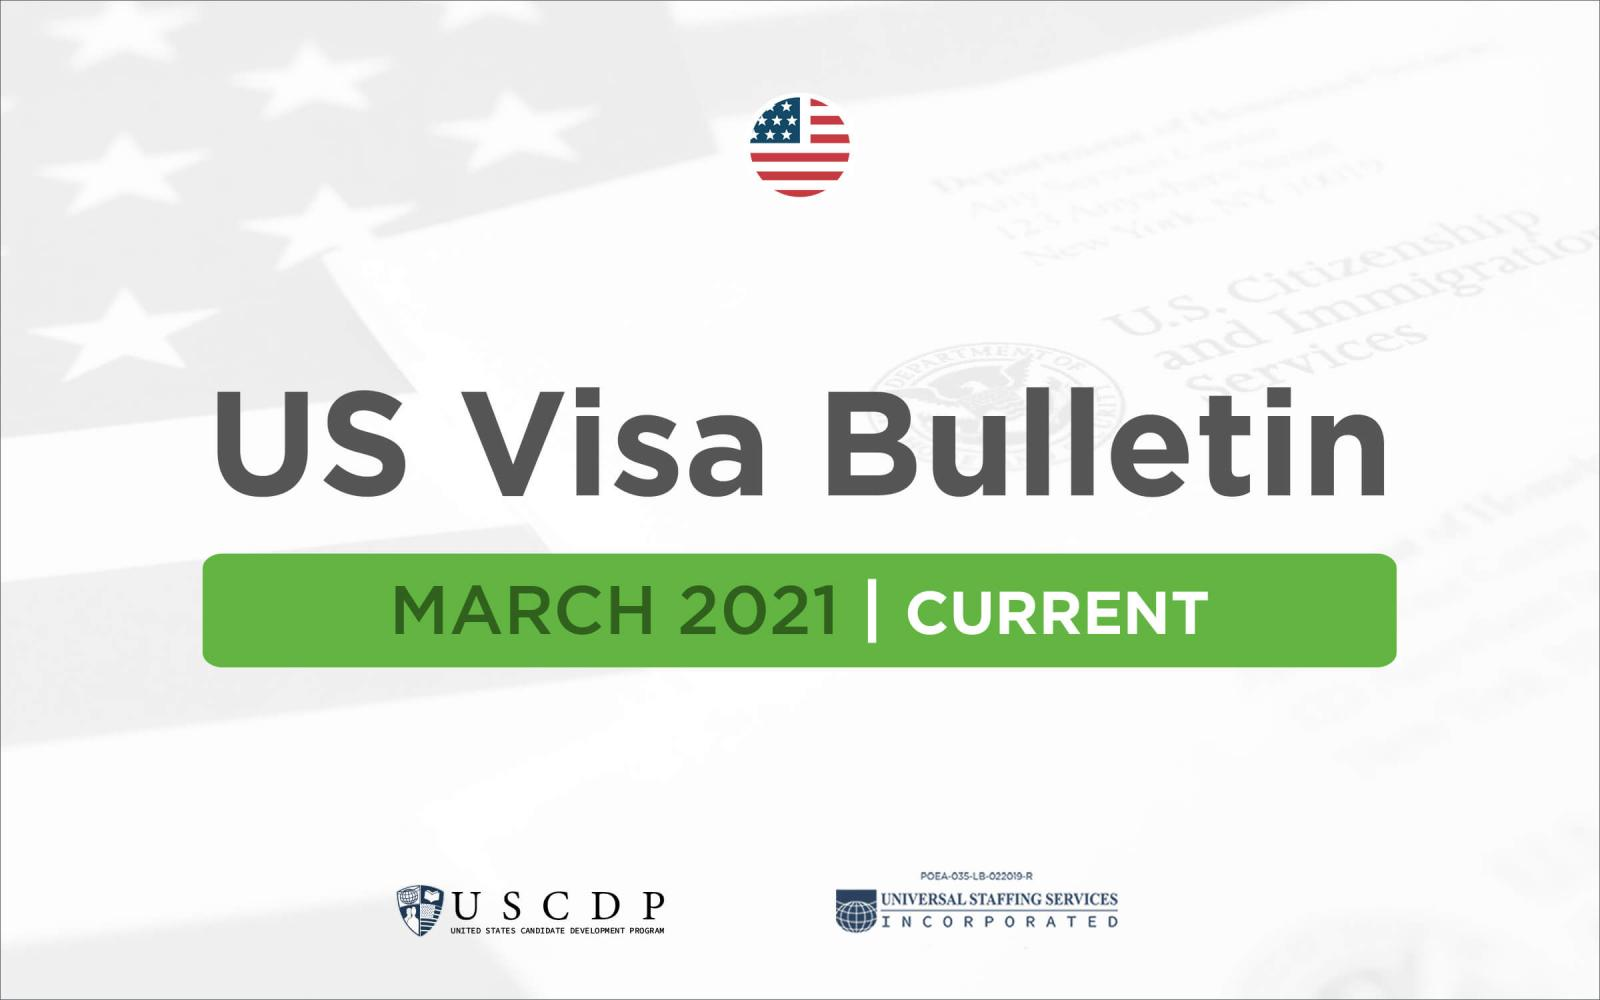 US Visa Bulletin Article Header